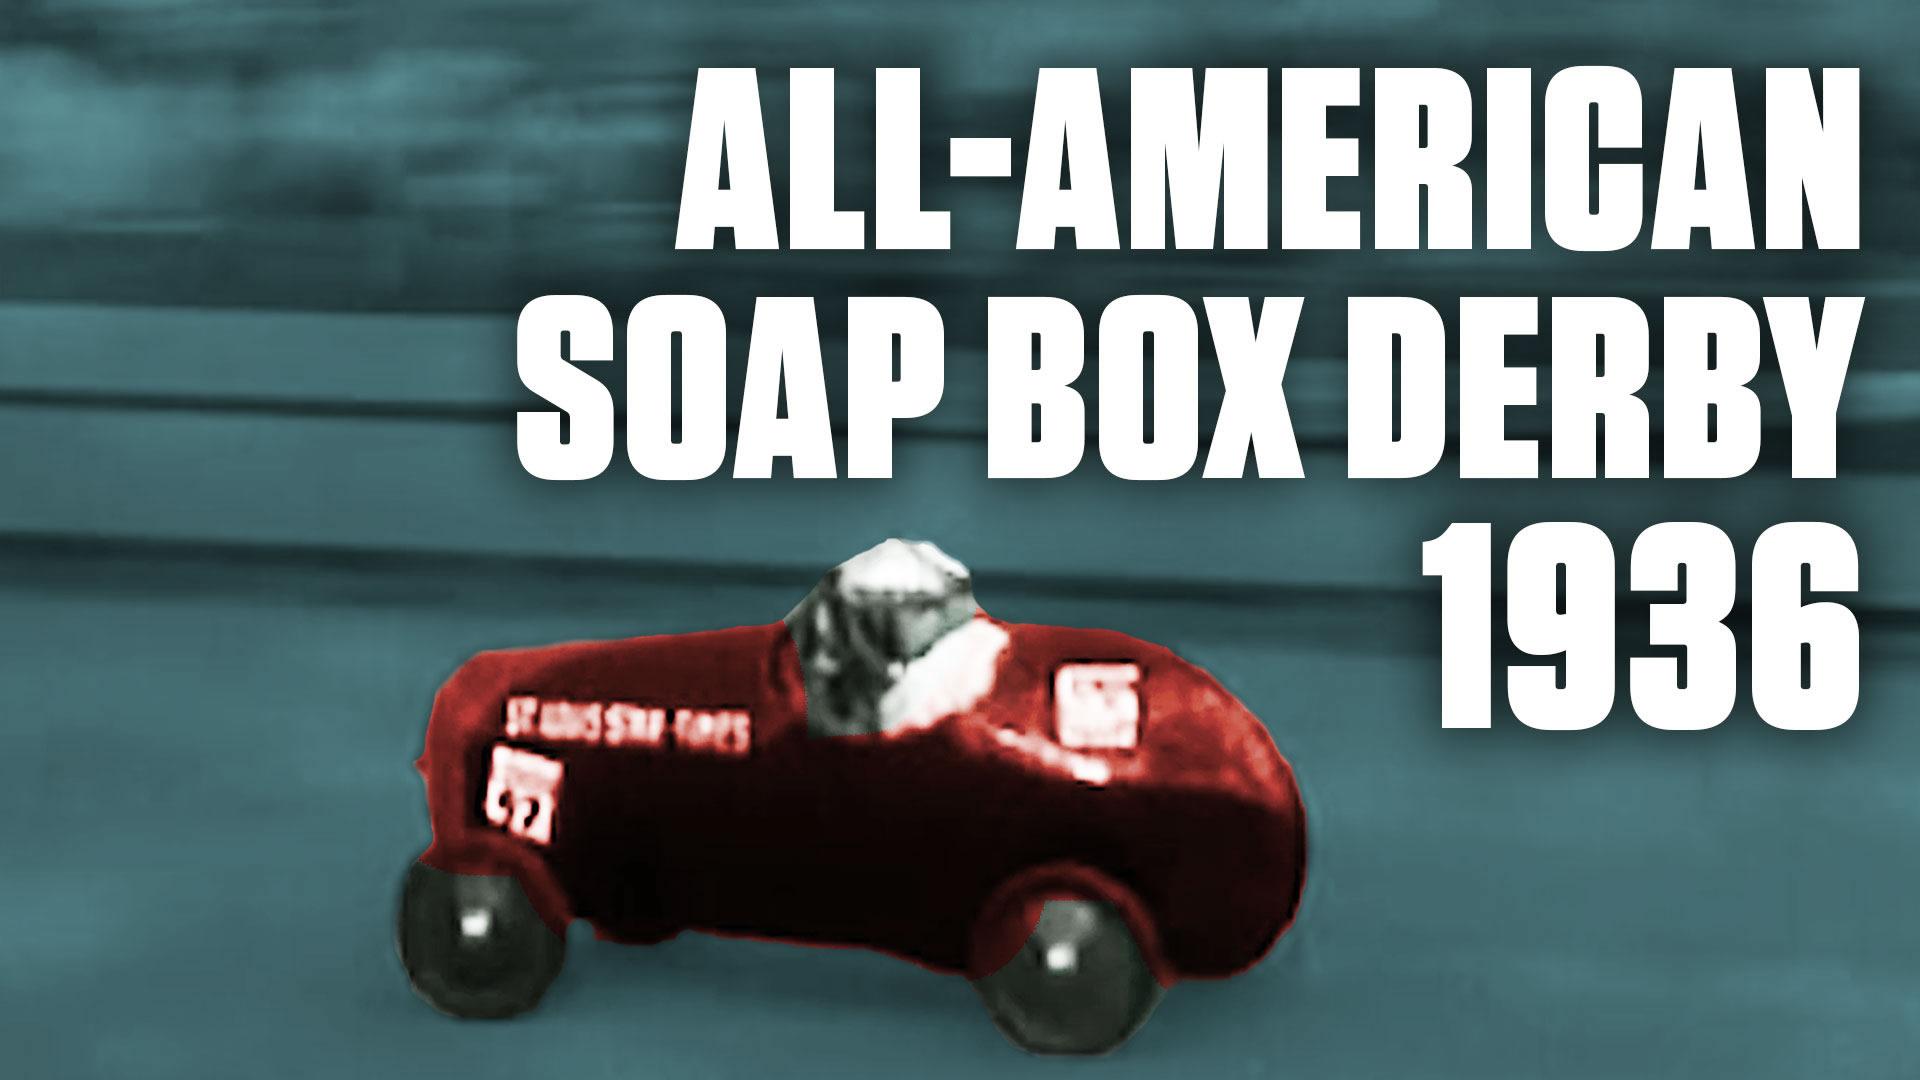 The 1936 Soap Box Derby Drew 100,000 Rowdy Spectators: Video